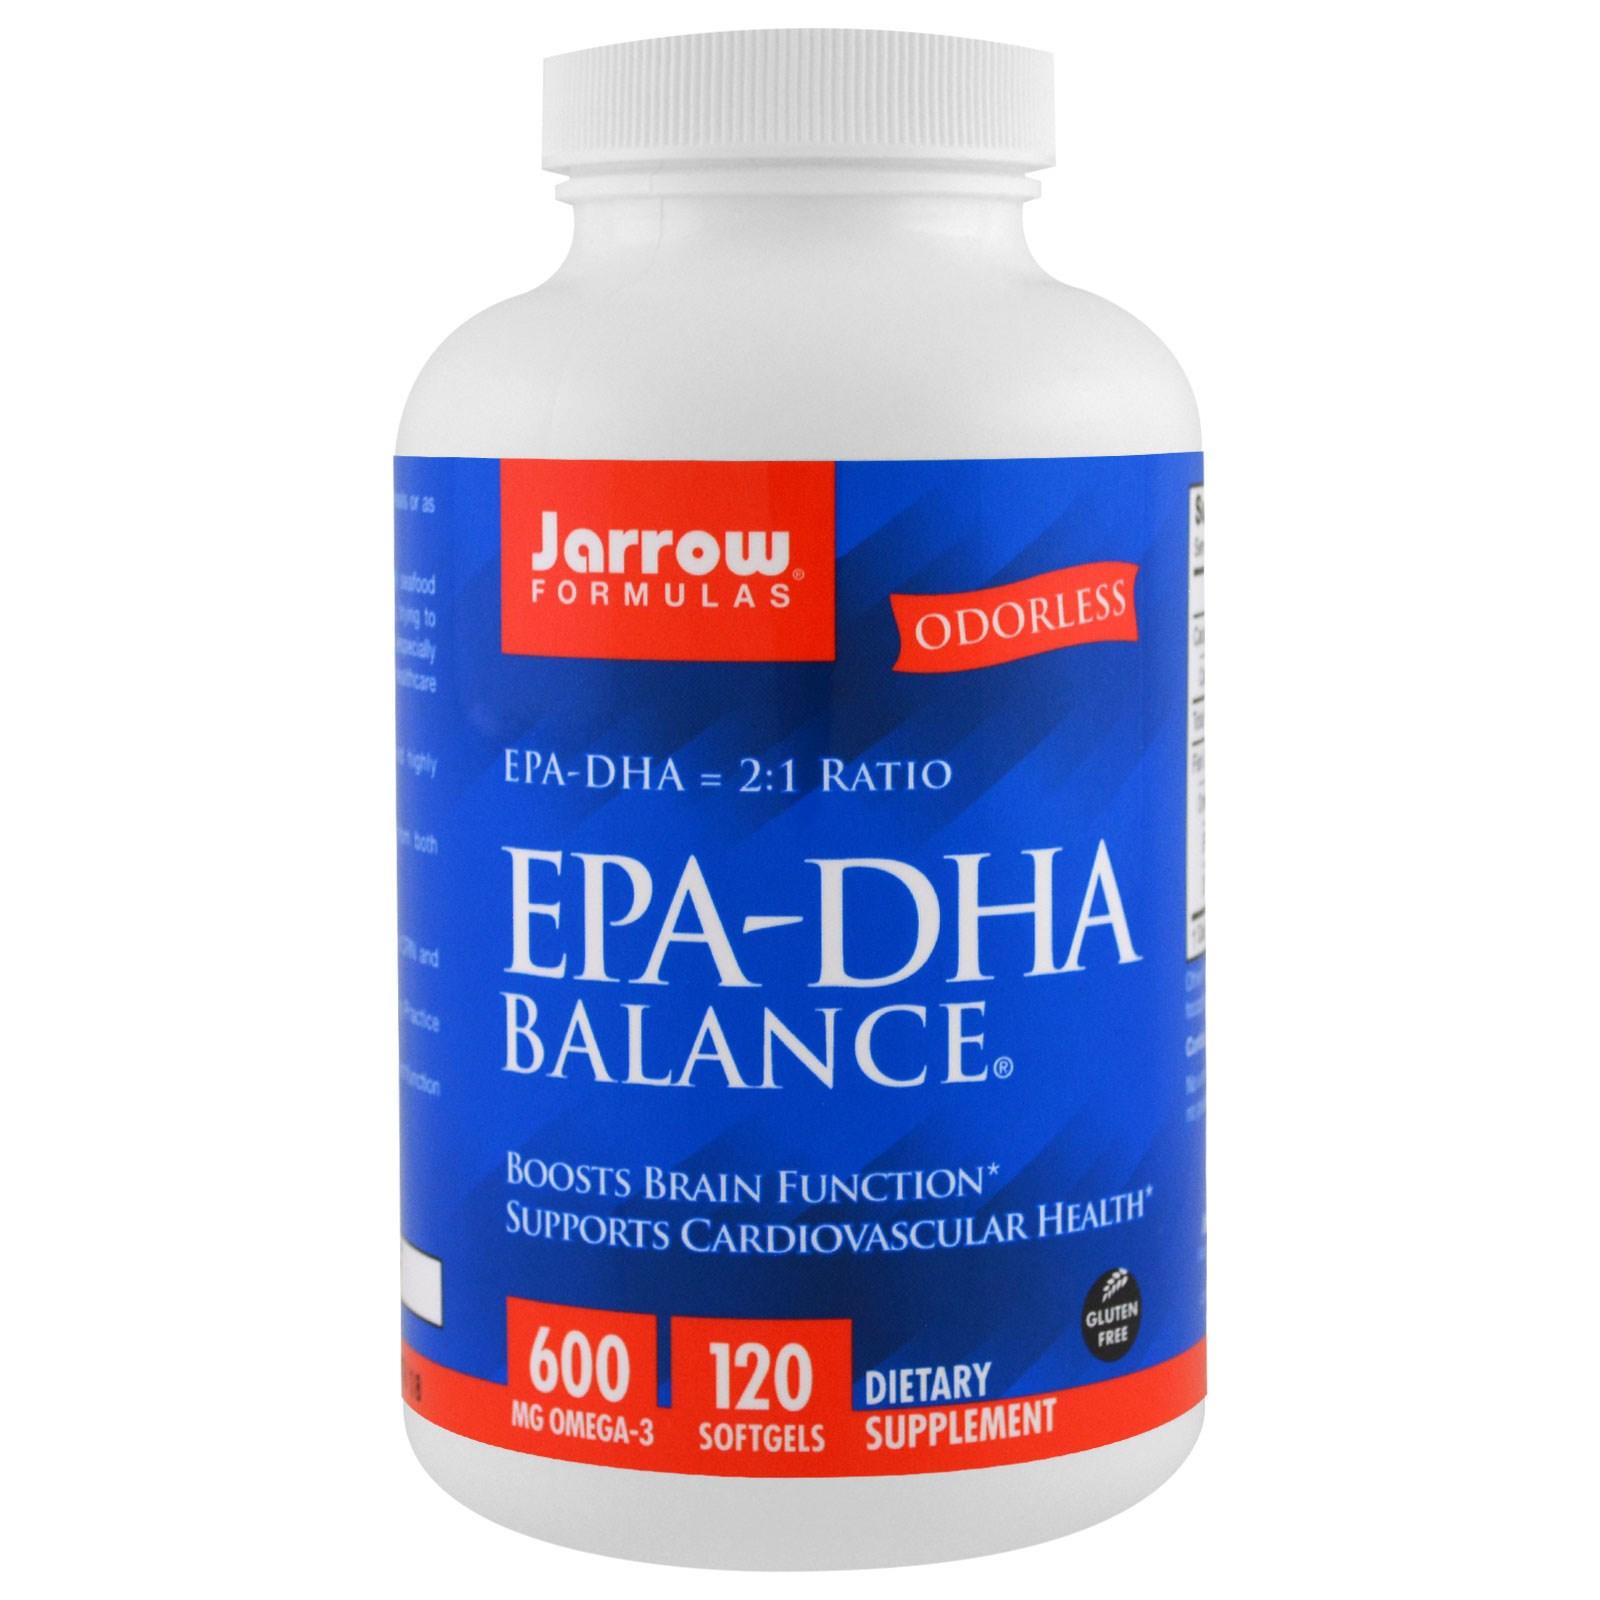 Image of EPA-DHA Balance (120 Softgels) - Jarrow Formulas 0790011160366